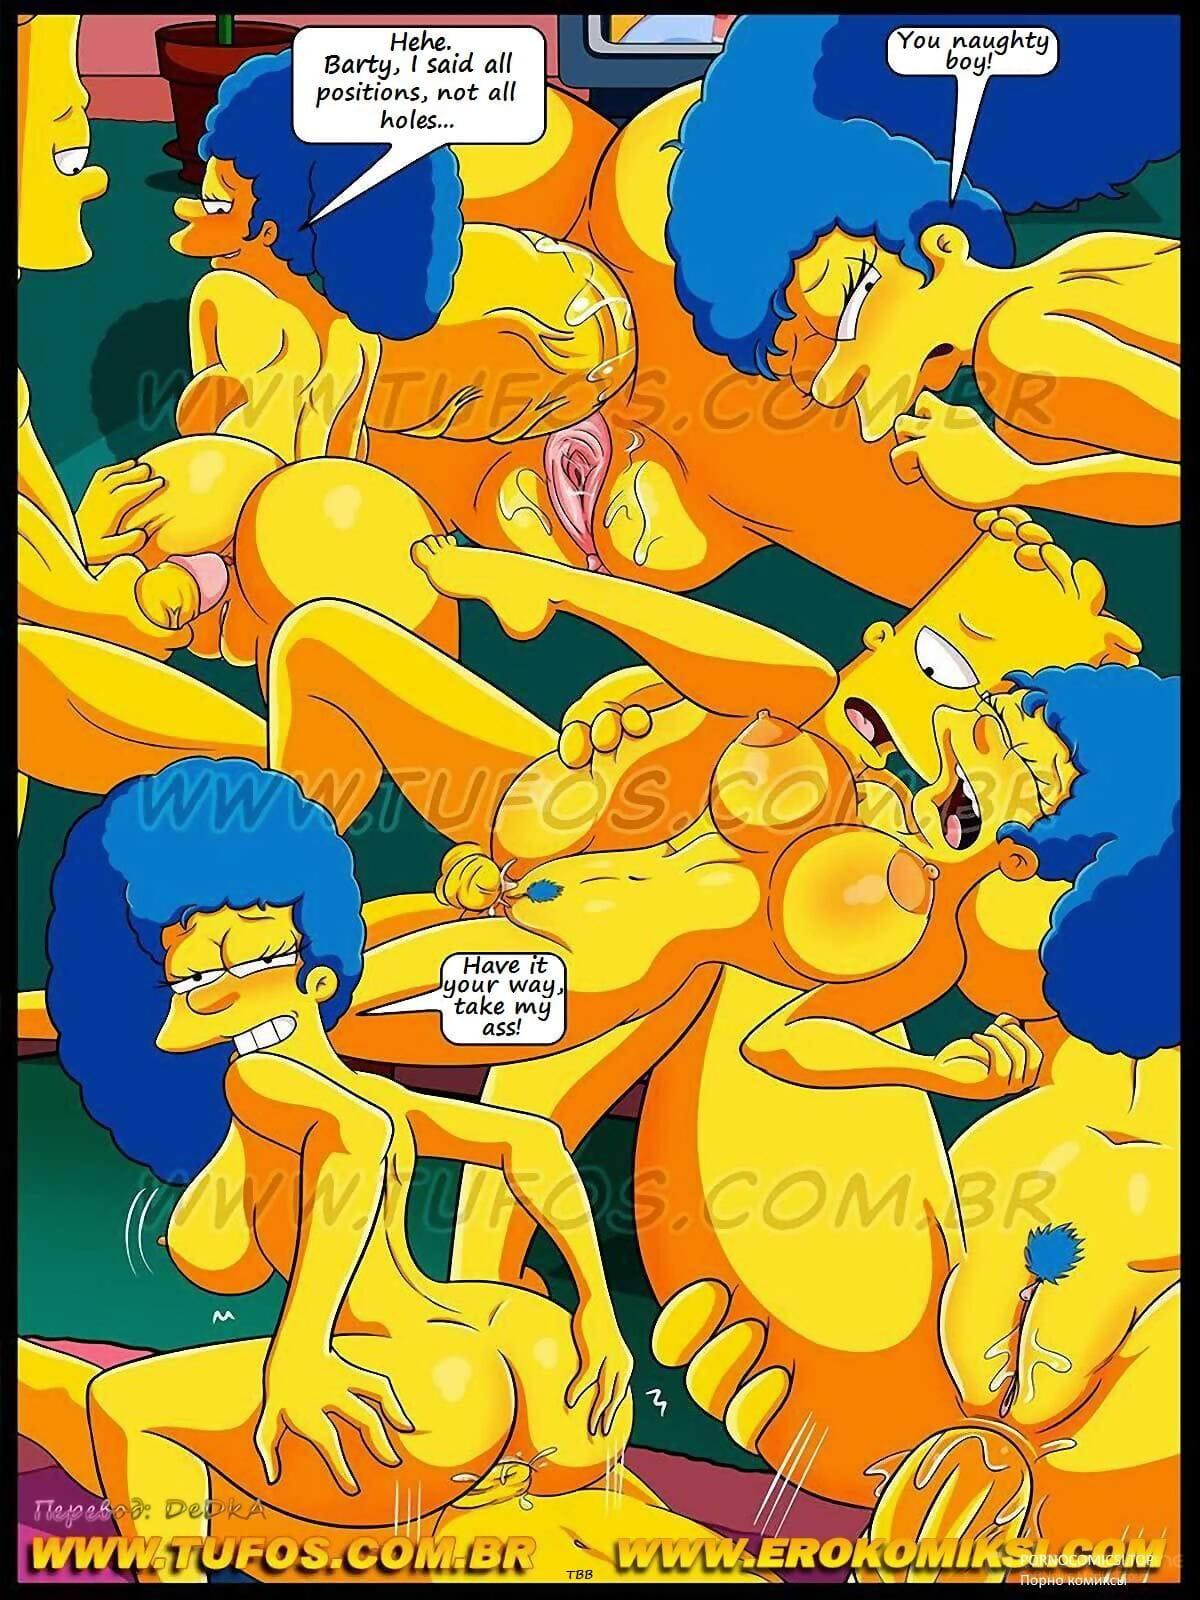 Simpsons hentai the The Sexpsons